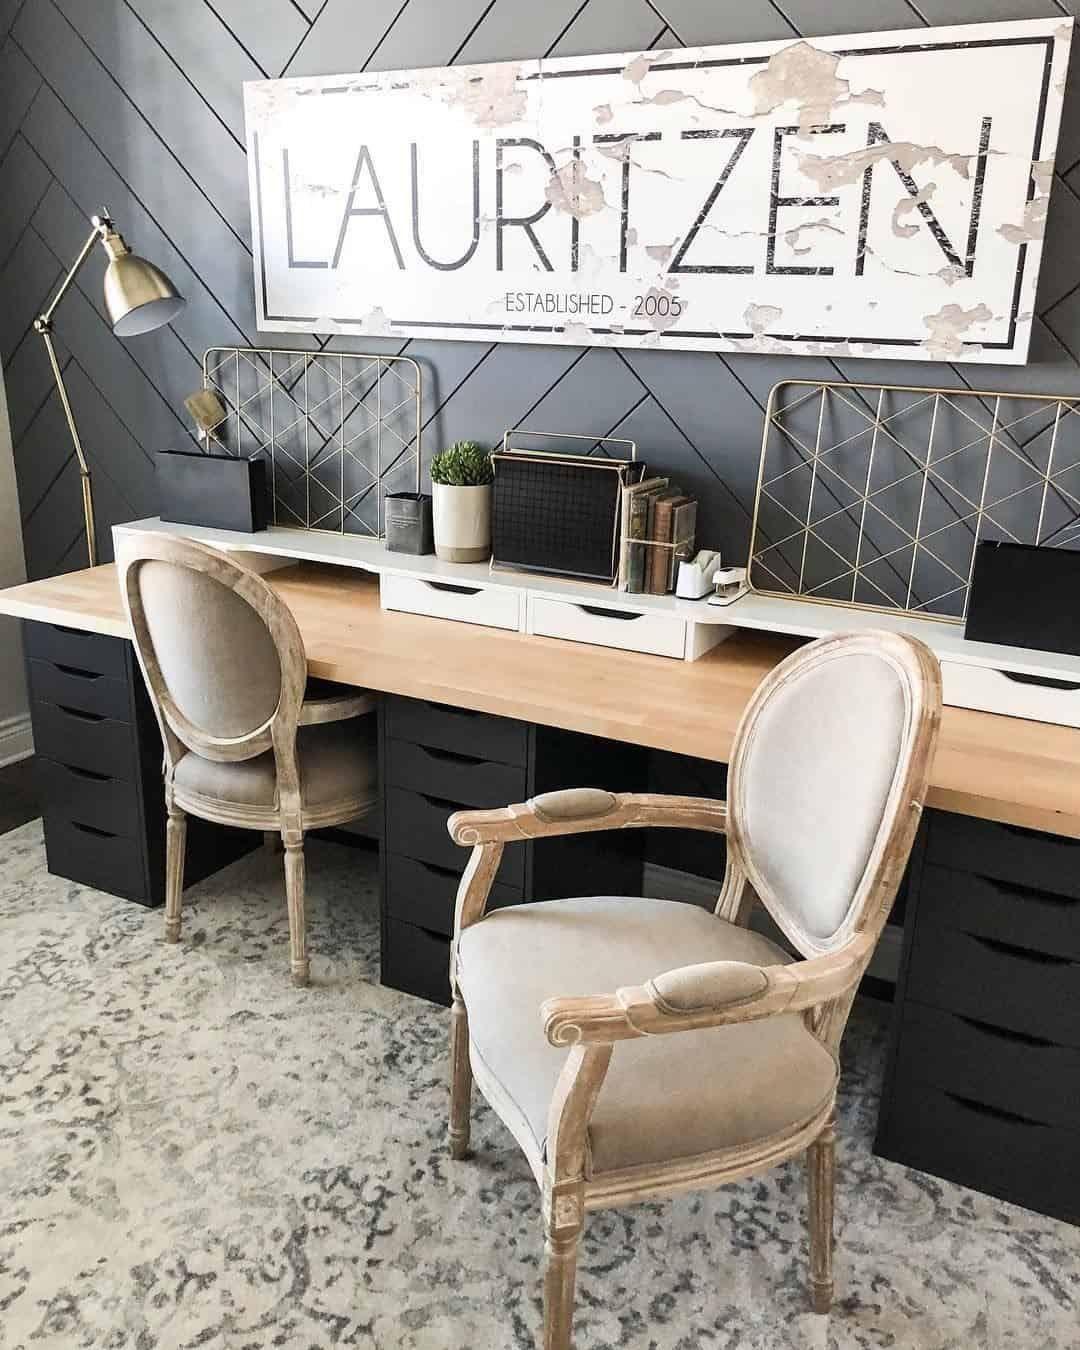 27 Inspirierende Ikea Desk Hacks Die Sie Lieben Werden In 2020 Home Office Design Ikea Desk Hack Ikea Desk